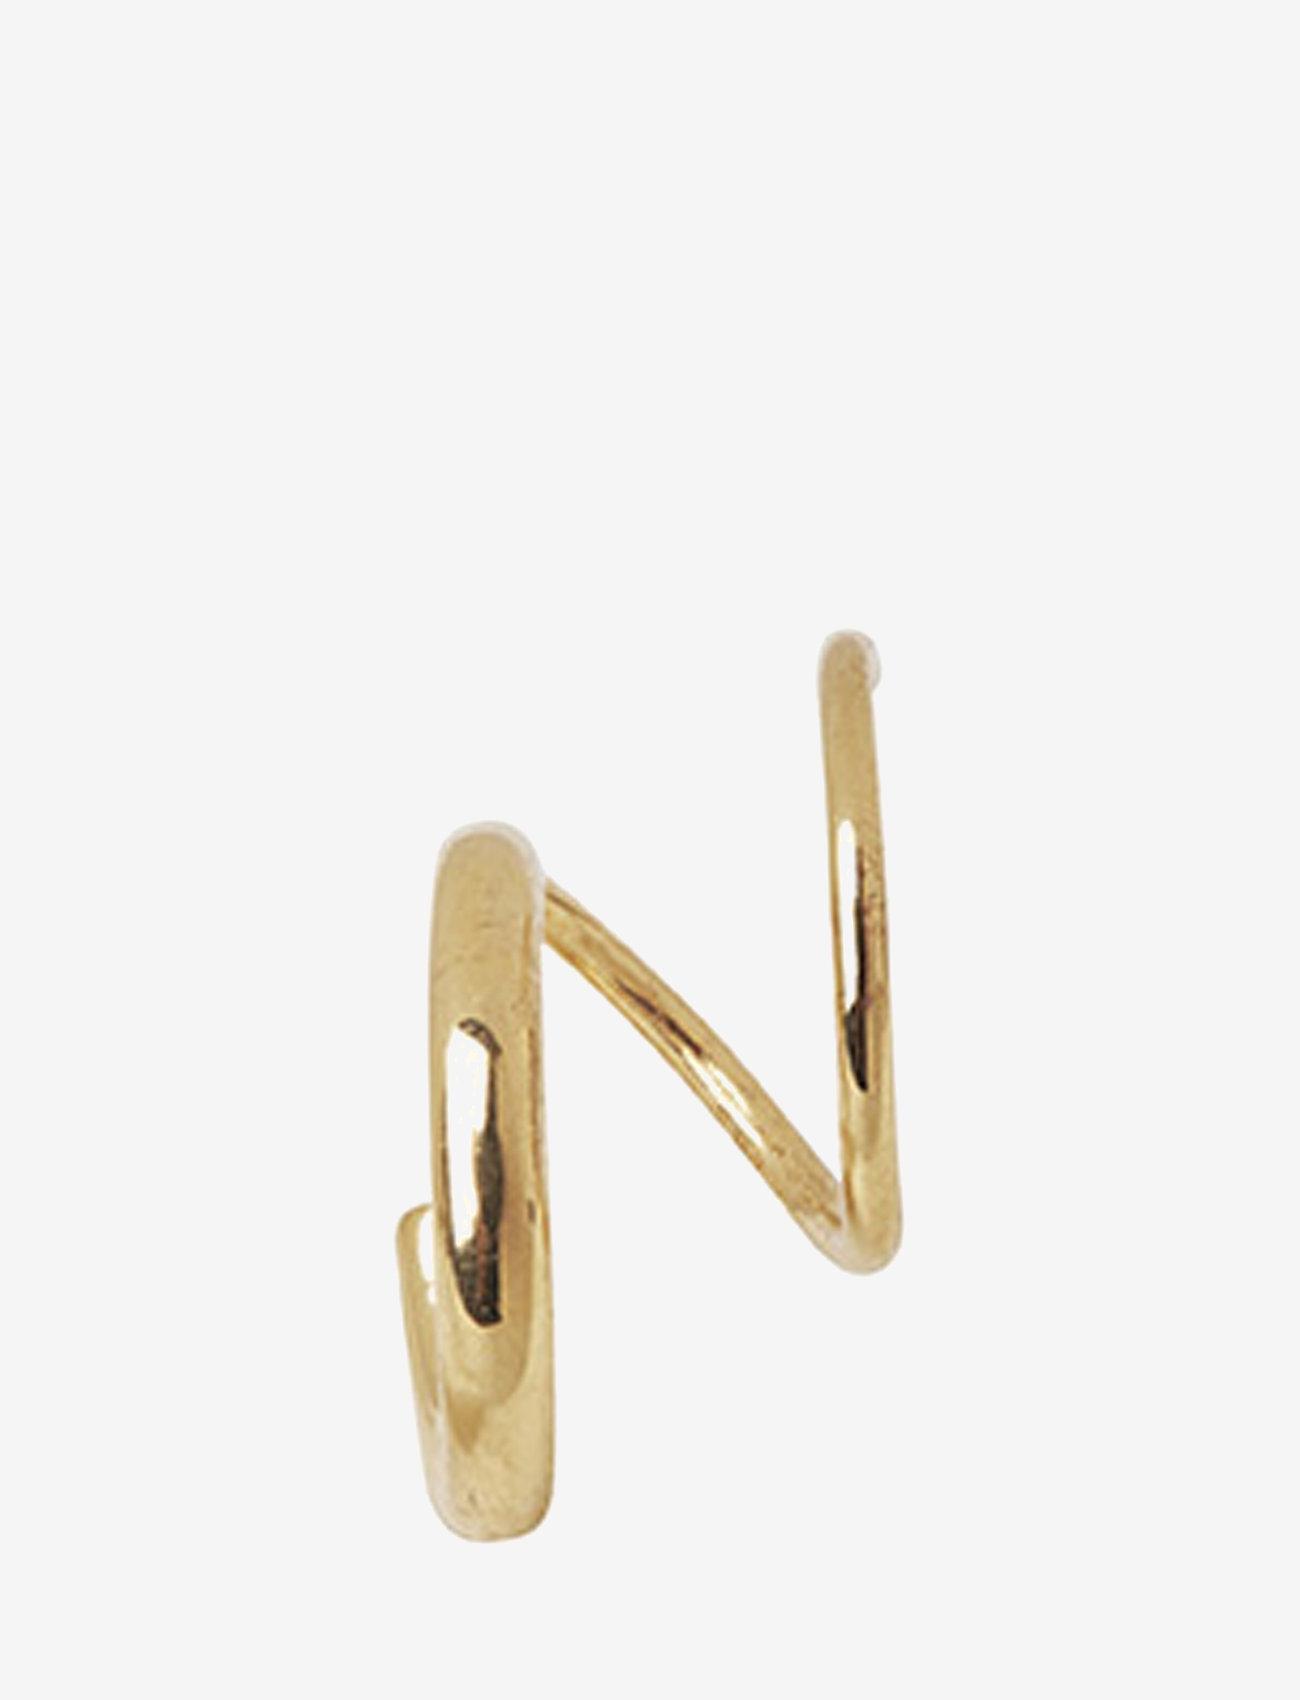 Maria Black - Dogma Twirl Earring - statement earrings - gold hp - 1